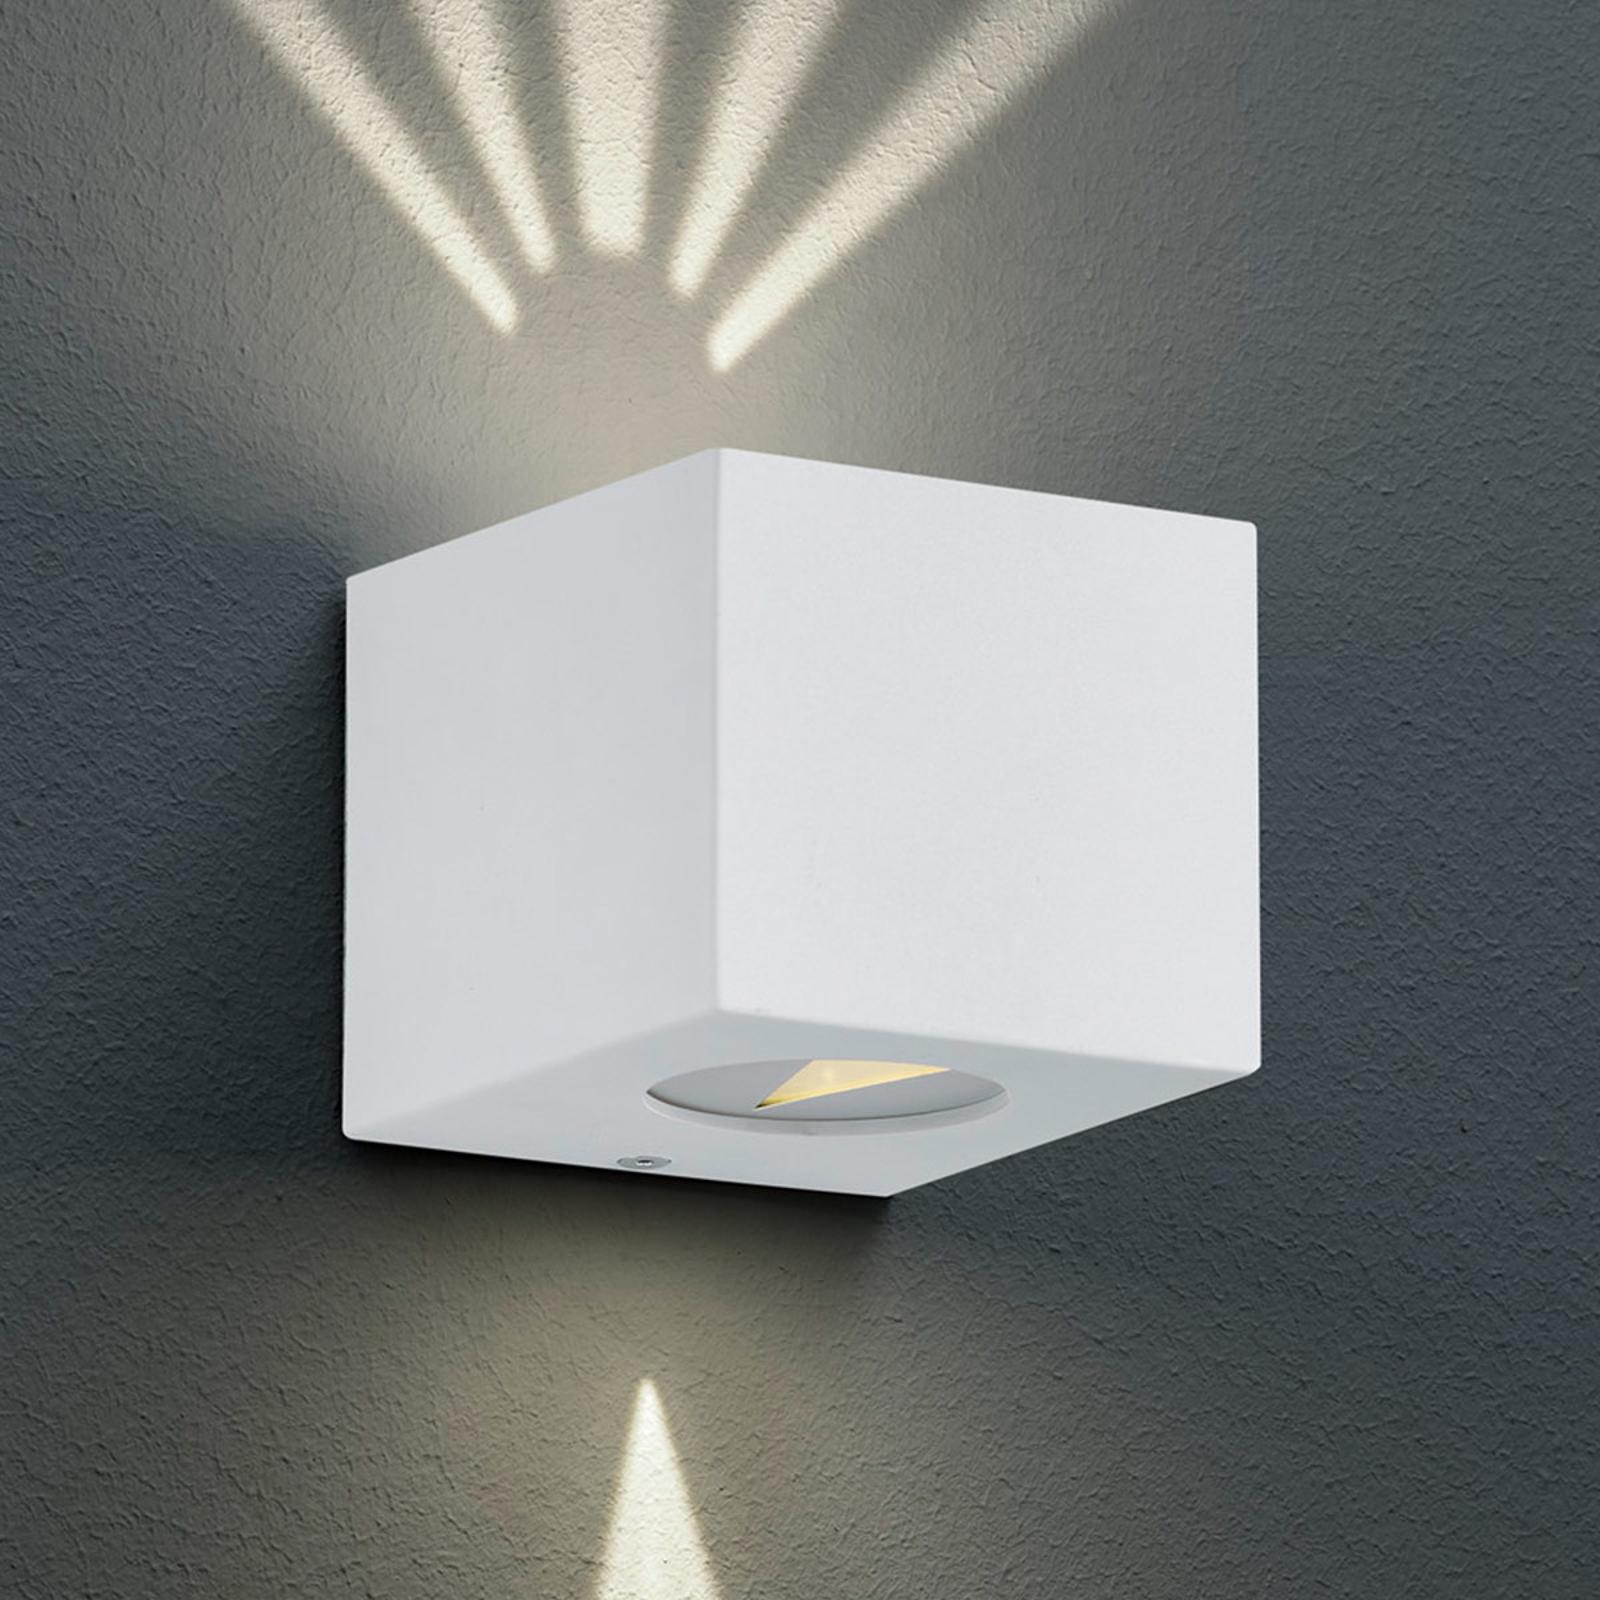 Eckige LED-Außenwandleuchte Cordoba, weiß